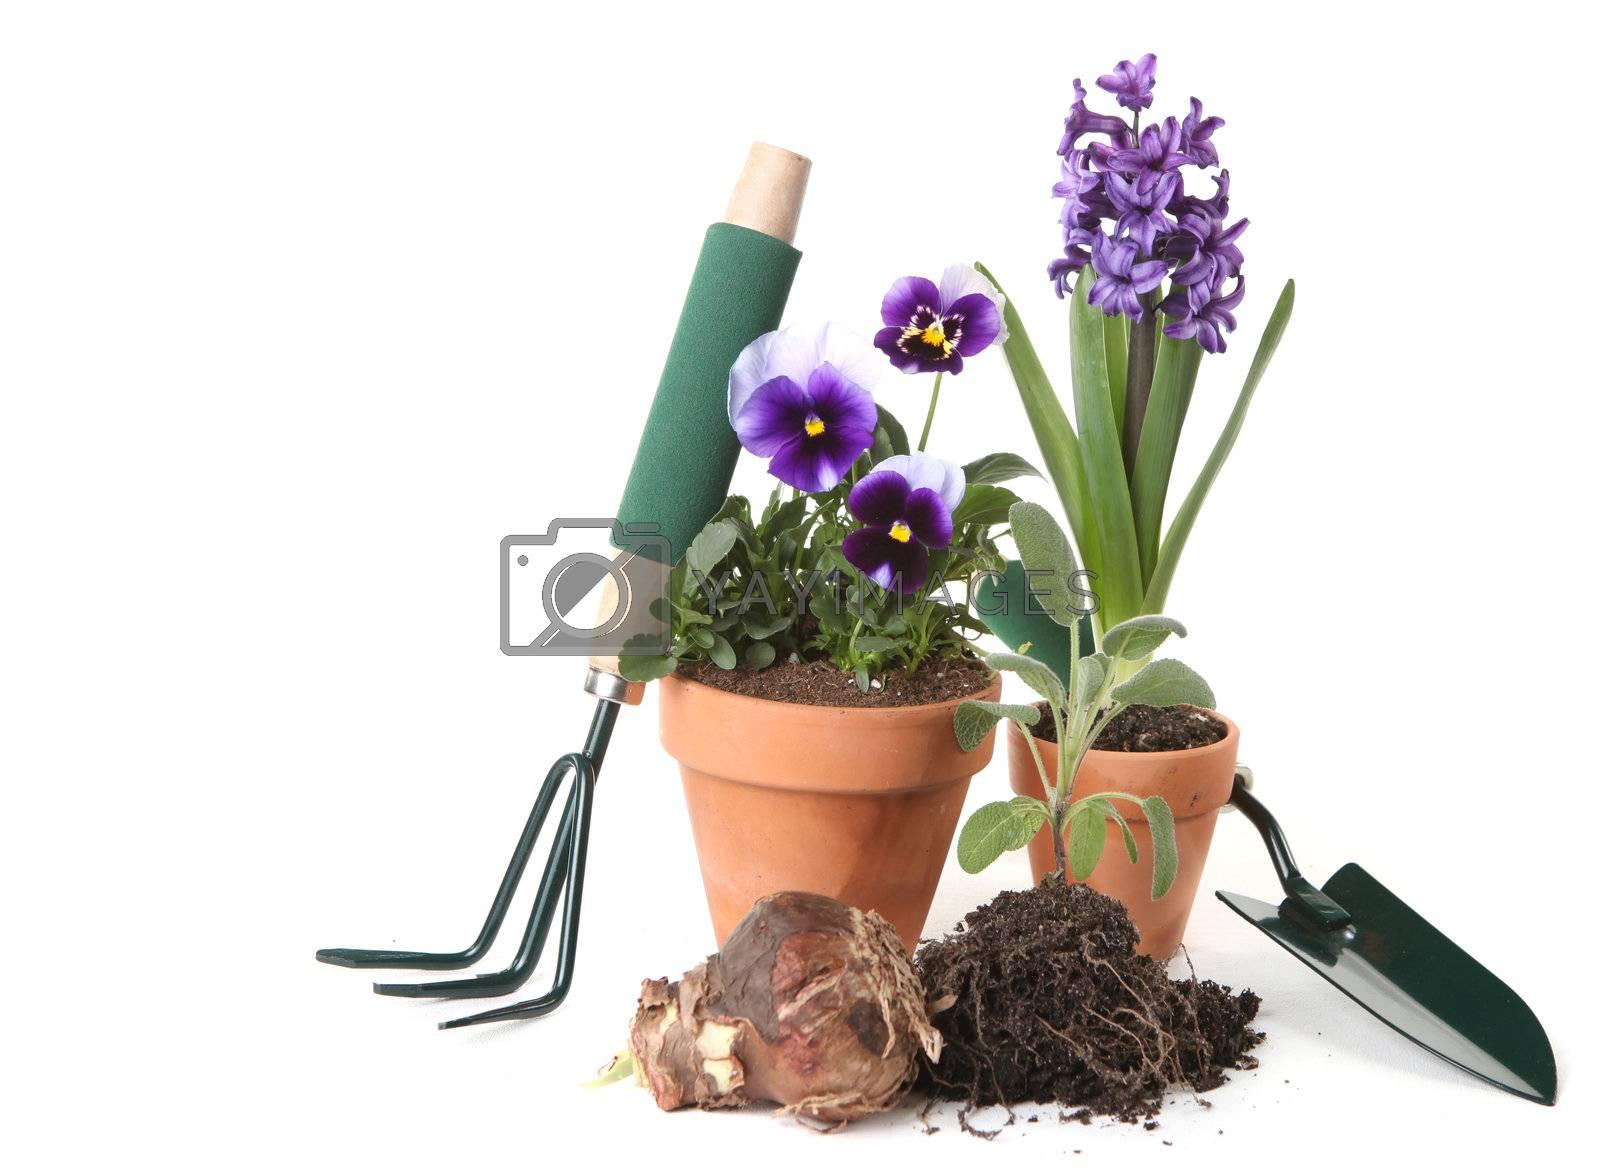 Royalty free image of Potted New Plantings Celebrating Springtime Gardening by tobkatrina